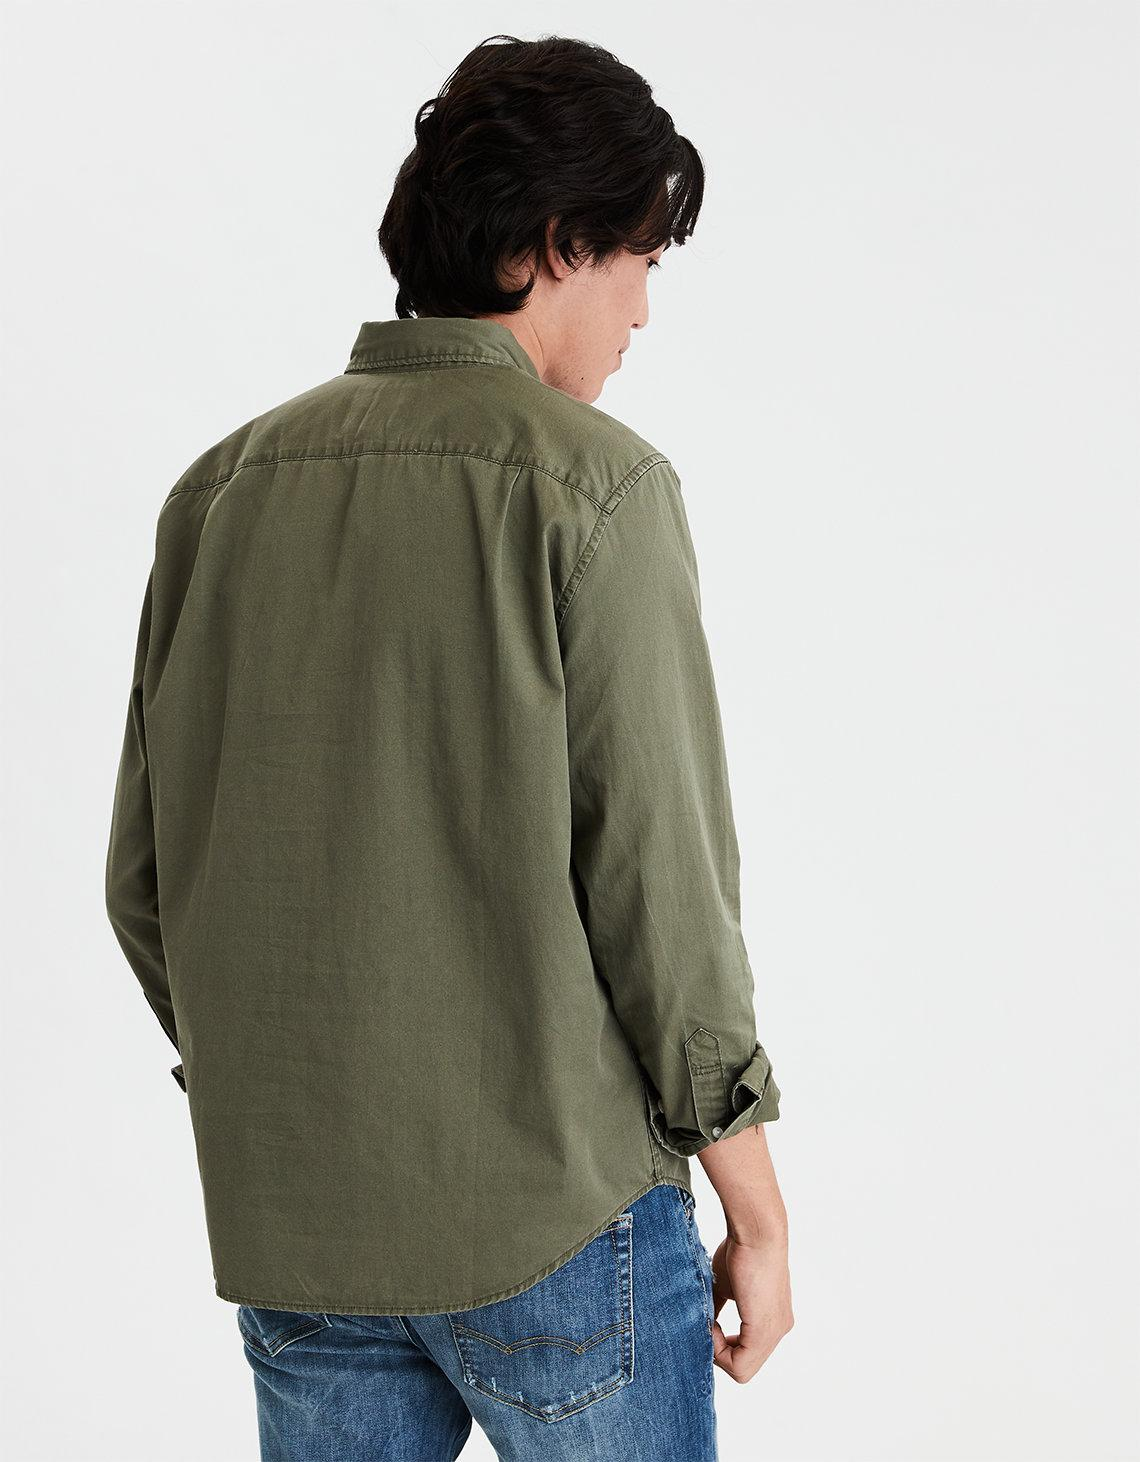 8e3ab78b2b Lyst - American Eagle Ae Long Sleeve Button Down Shirt in Green for Men